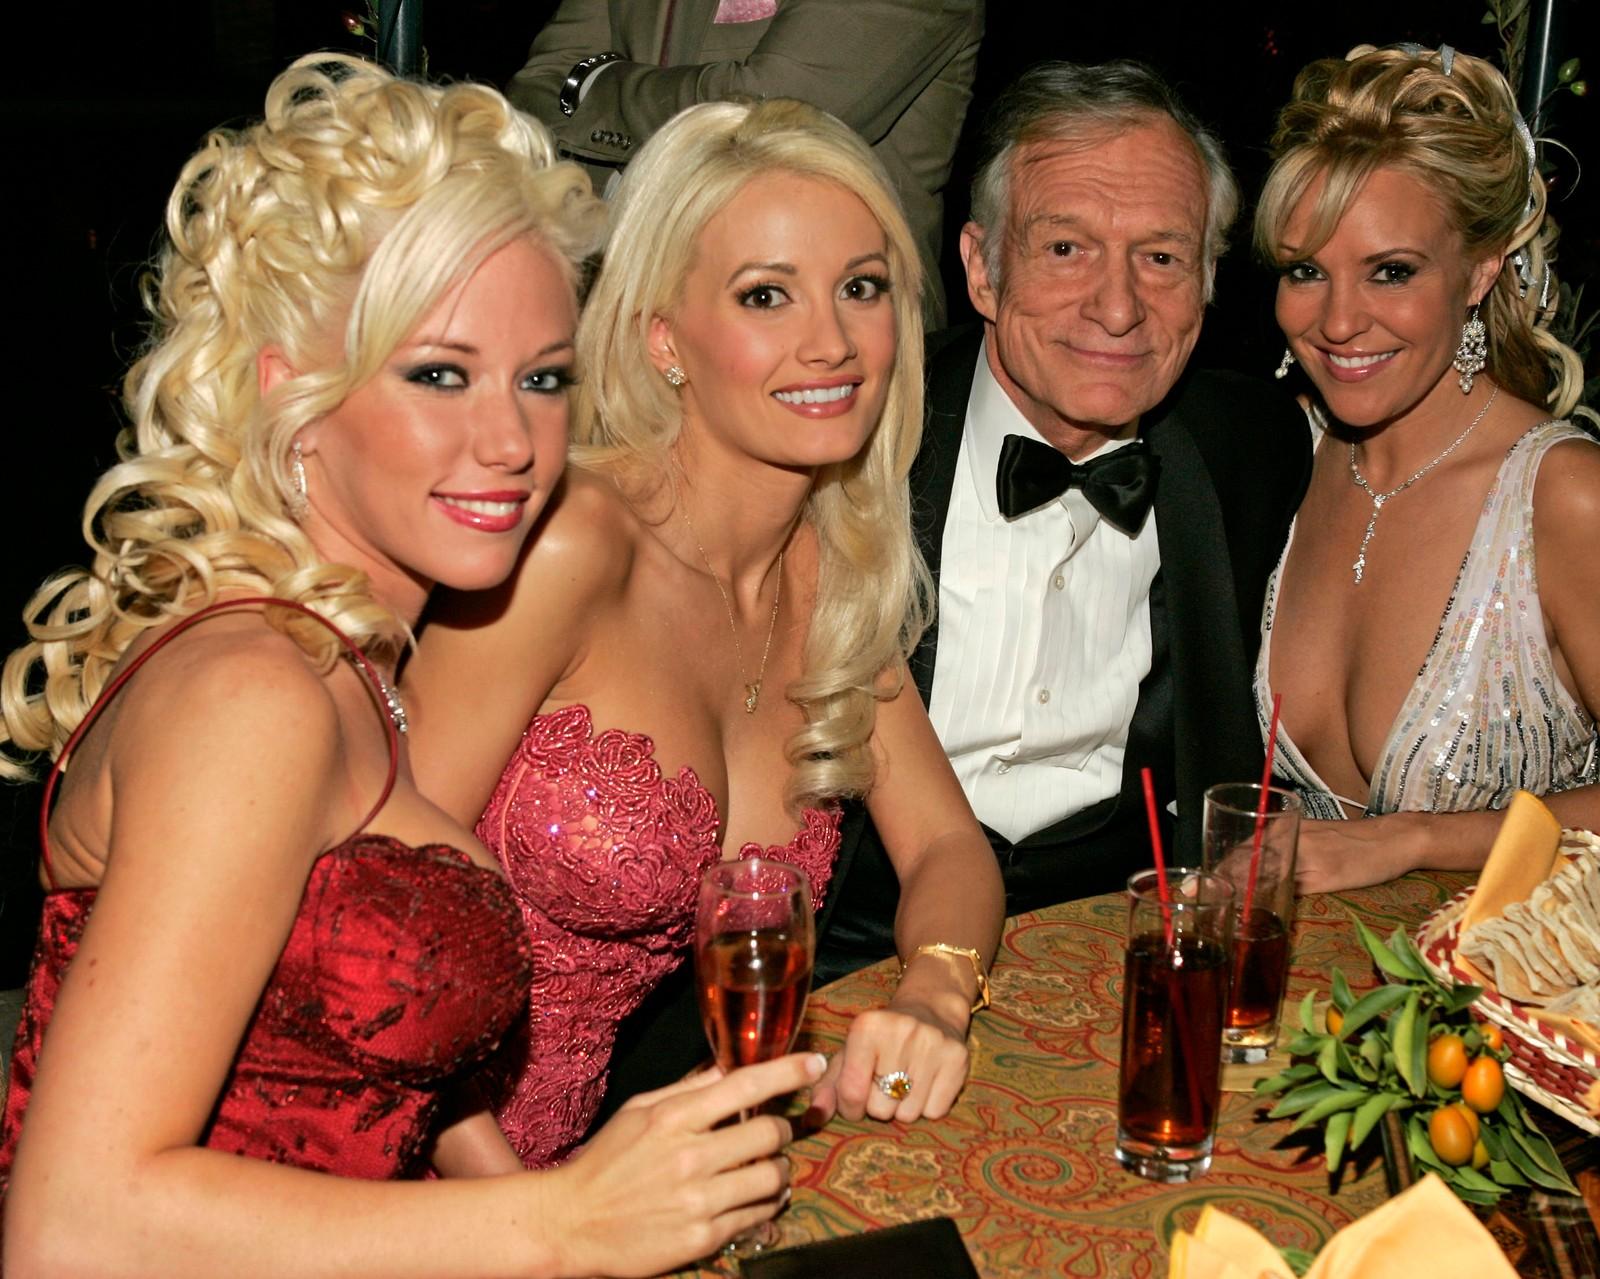 Hugh Hefner sammen med playmates Kendra, Holly og Bridget som figurerte i TV-serien Playboyjentene.